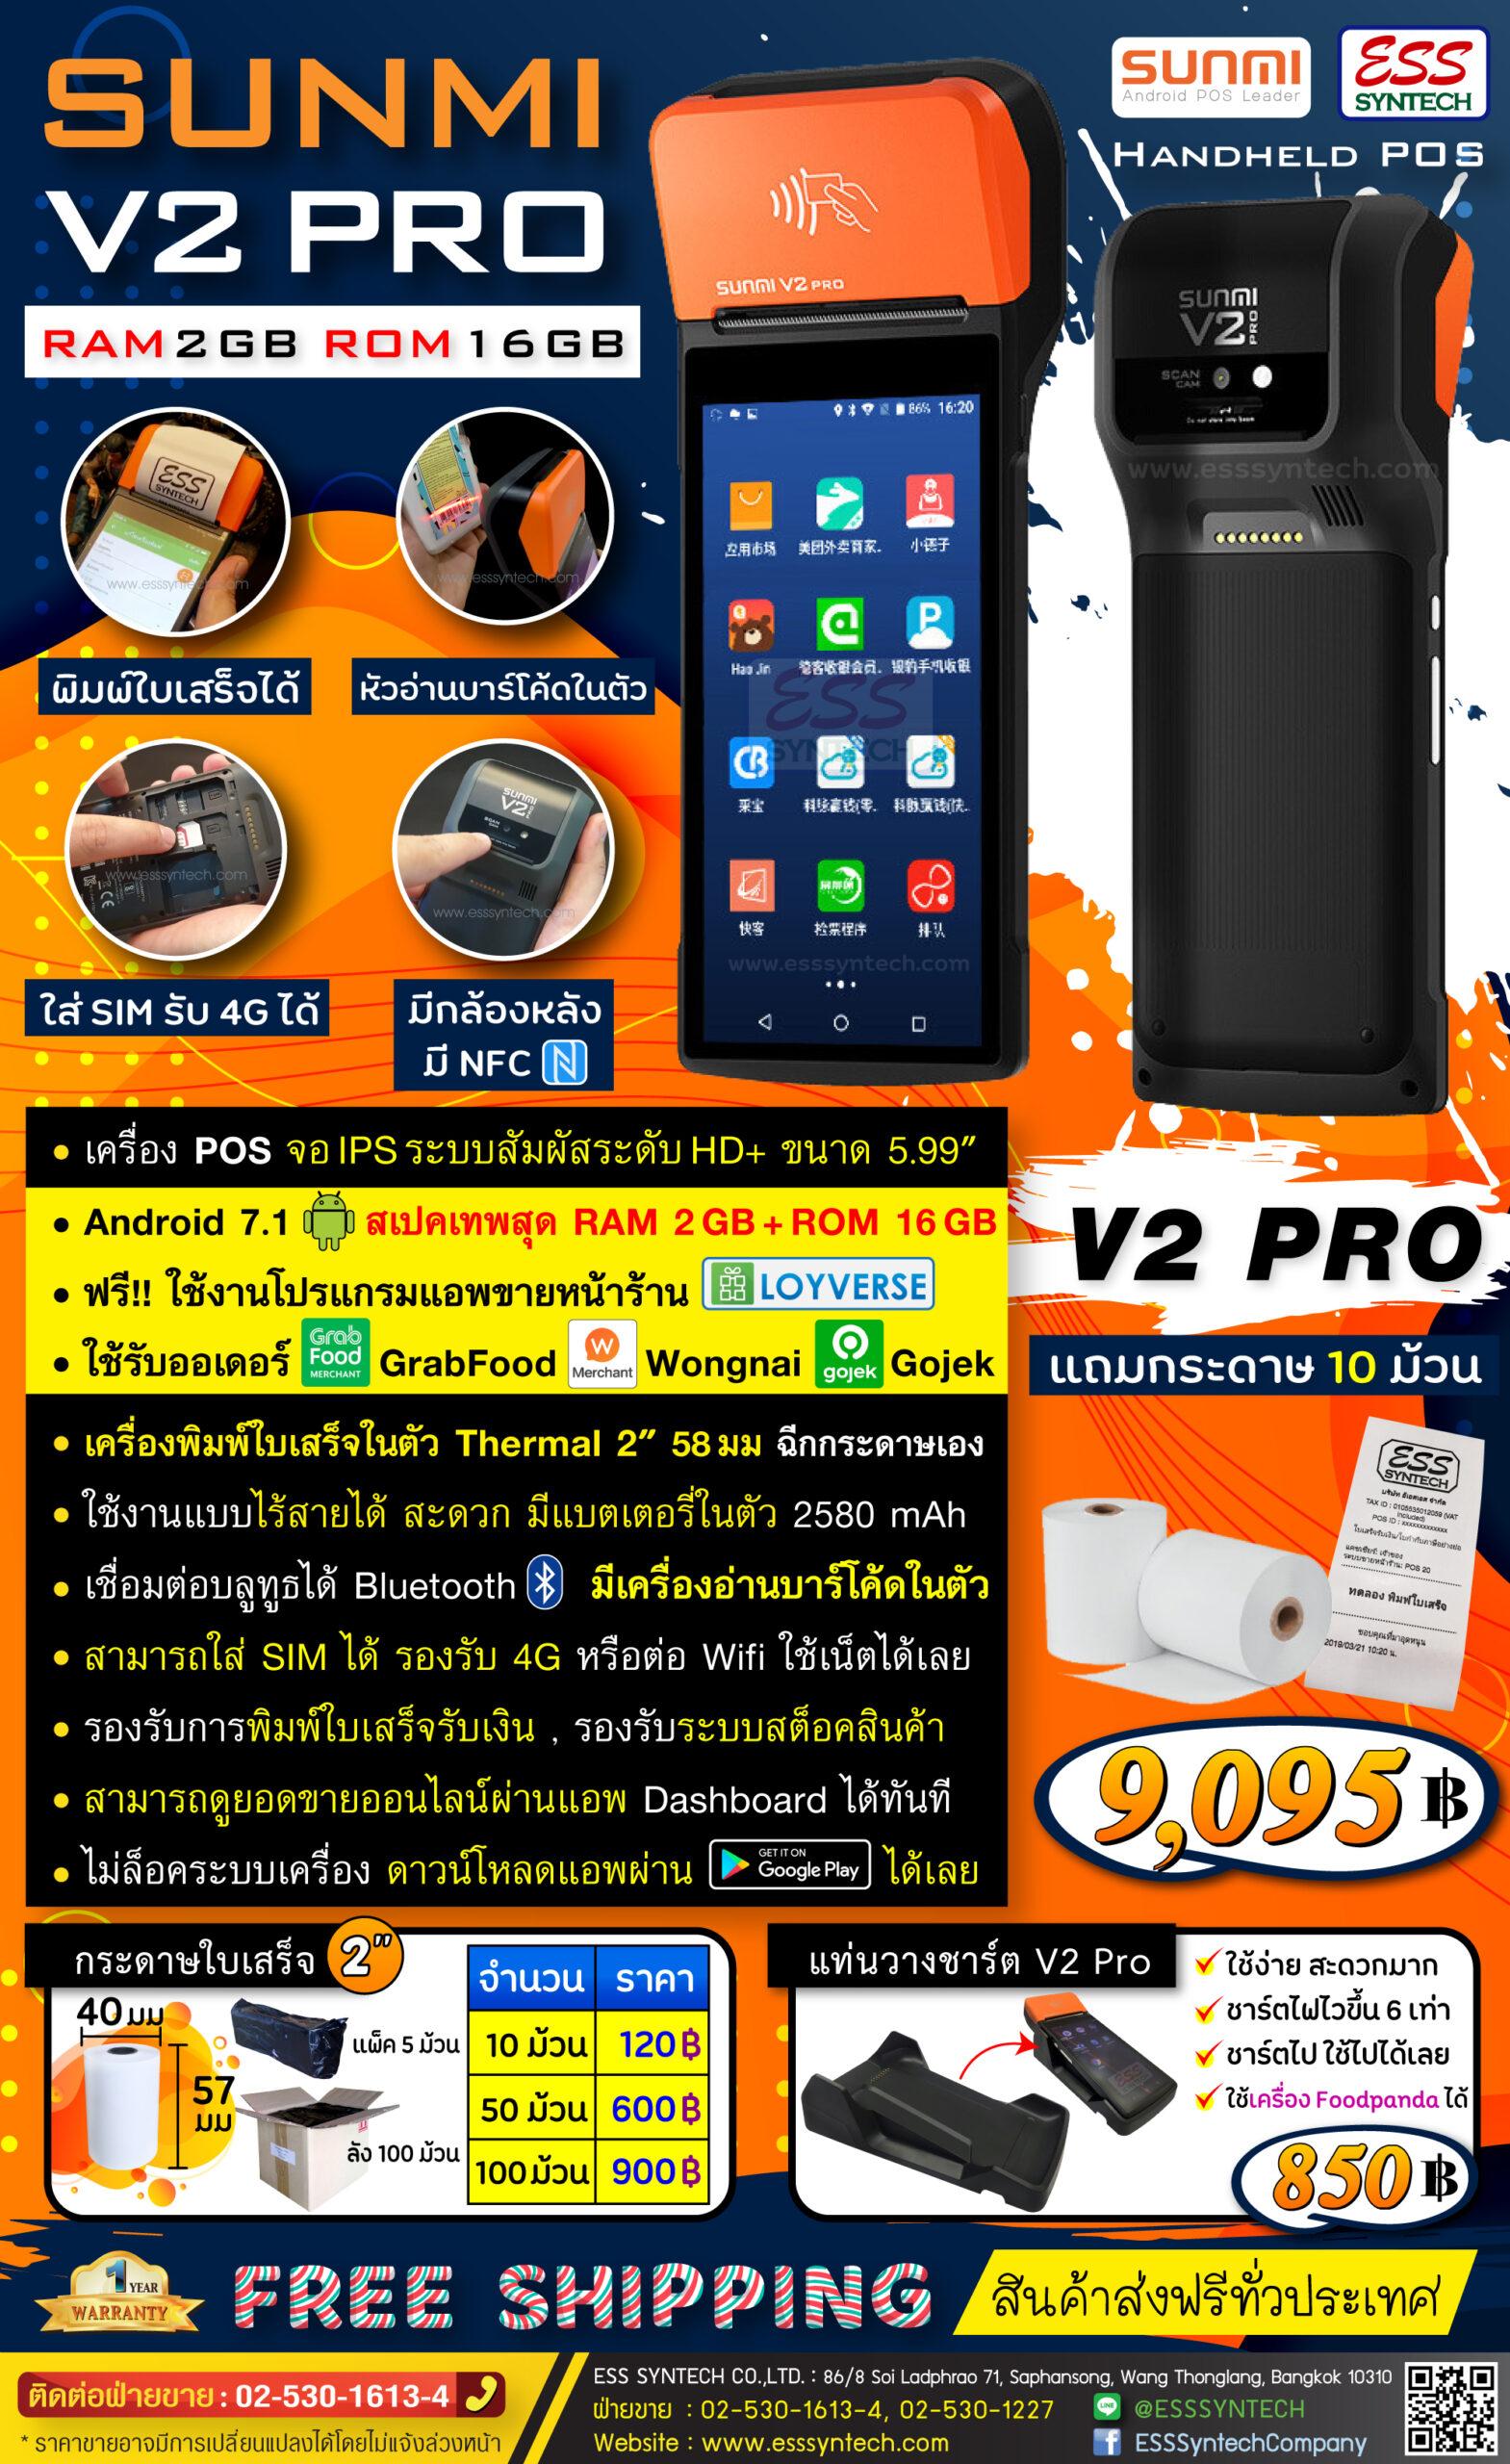 Sunmi V2 Pro เครื่องขายหน้าร้านแบบพกพา ระบบแอนดรอย์ RAM 2 GB ROM 16 GB พิมพ์ใบเสร็จและอ่านบาร์โค้ดในตัว